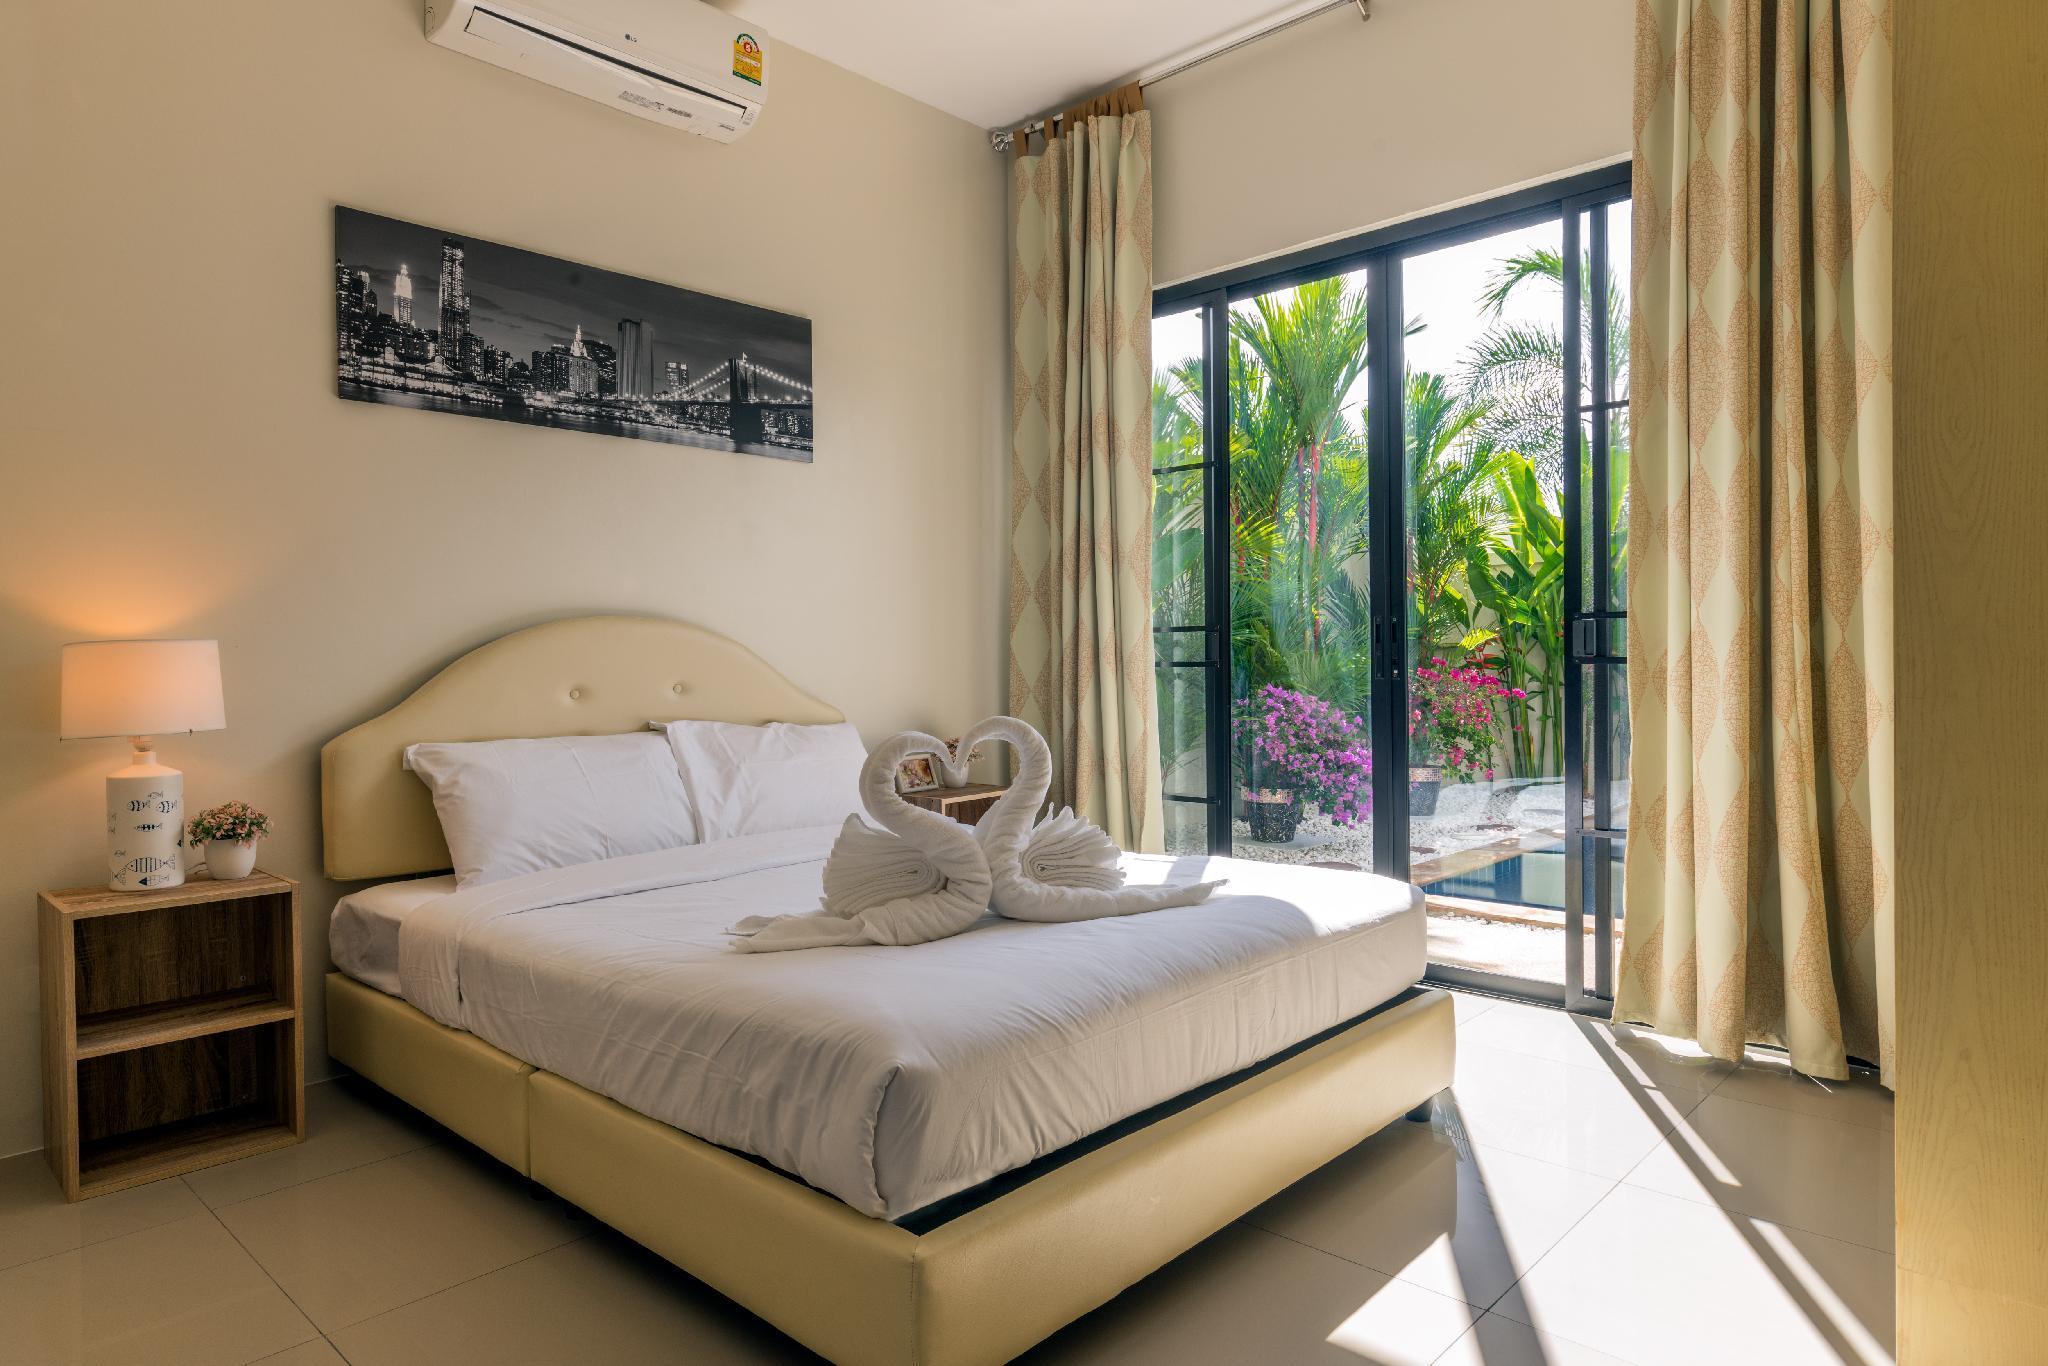 Dreamy 3br Boutique Pool Villa by IntiraVillas บ้านเดี่ยว 3 ห้องนอน 2 ห้องน้ำส่วนตัว ขนาด 300 ตร.ม. – หาดราไวย์